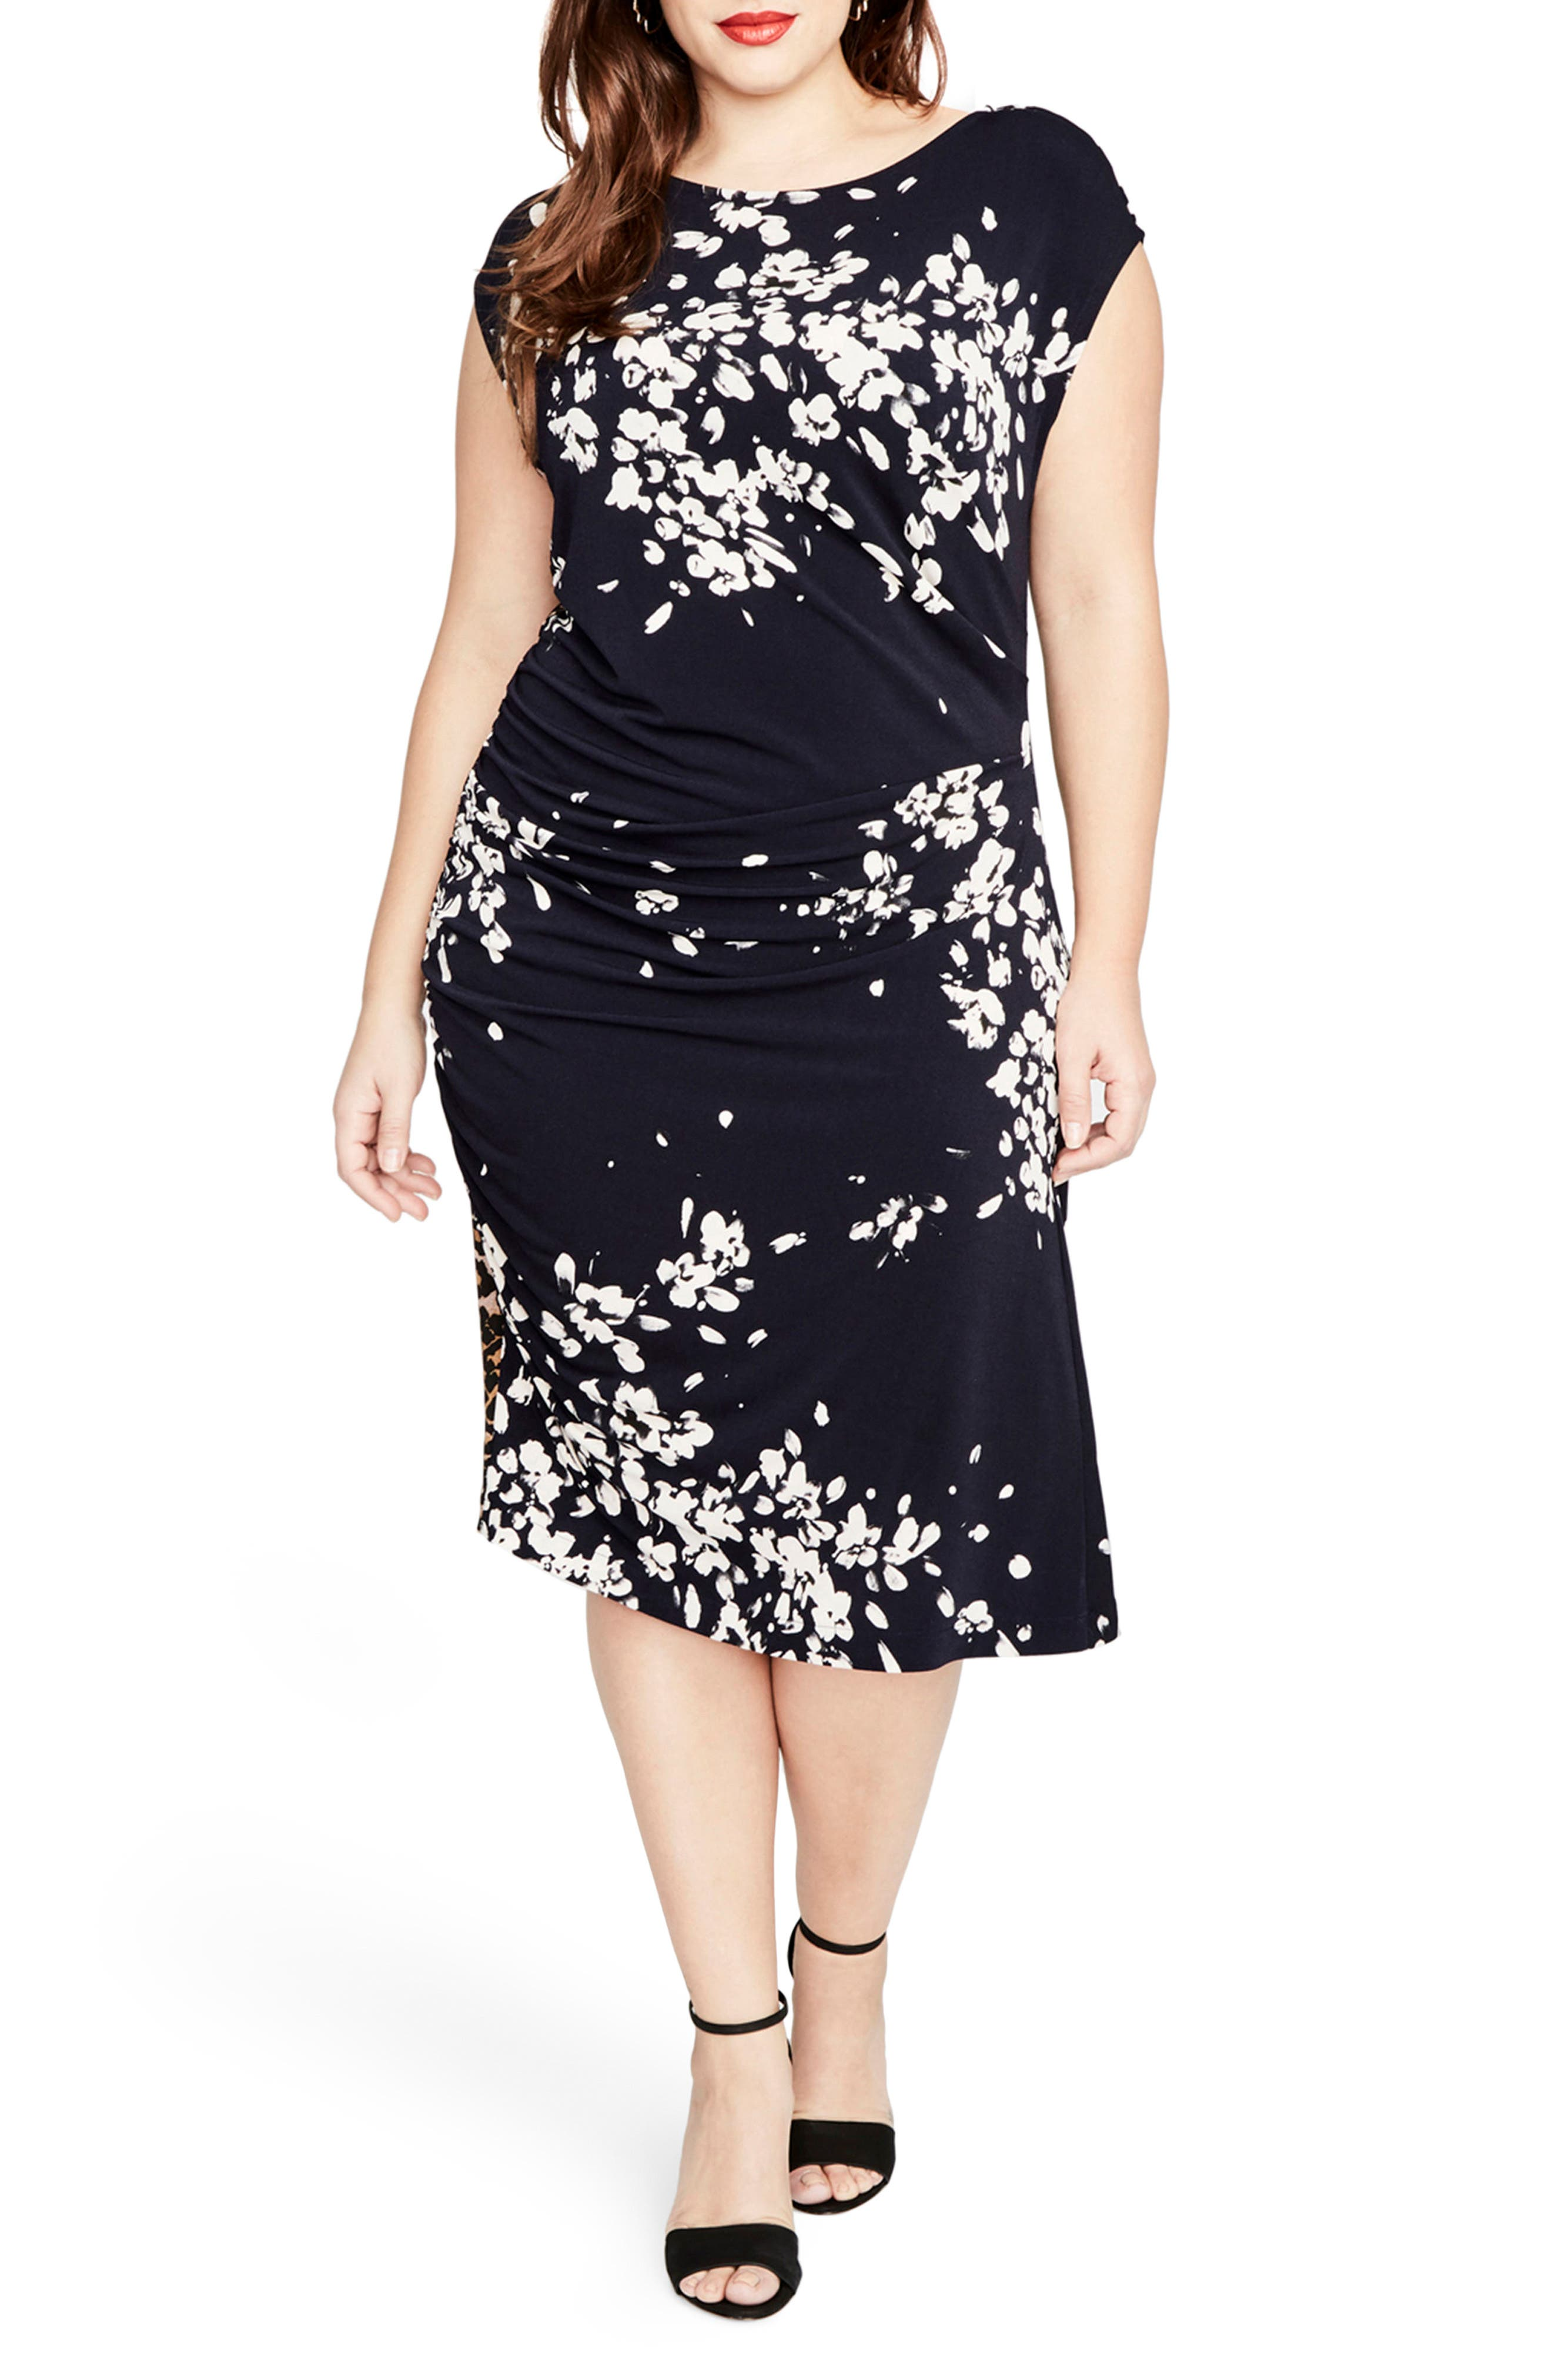 Alternate Image 1 Selected - RACHEL BY Rachel Roy Asymmetrical Floral Dress (Plus Size)